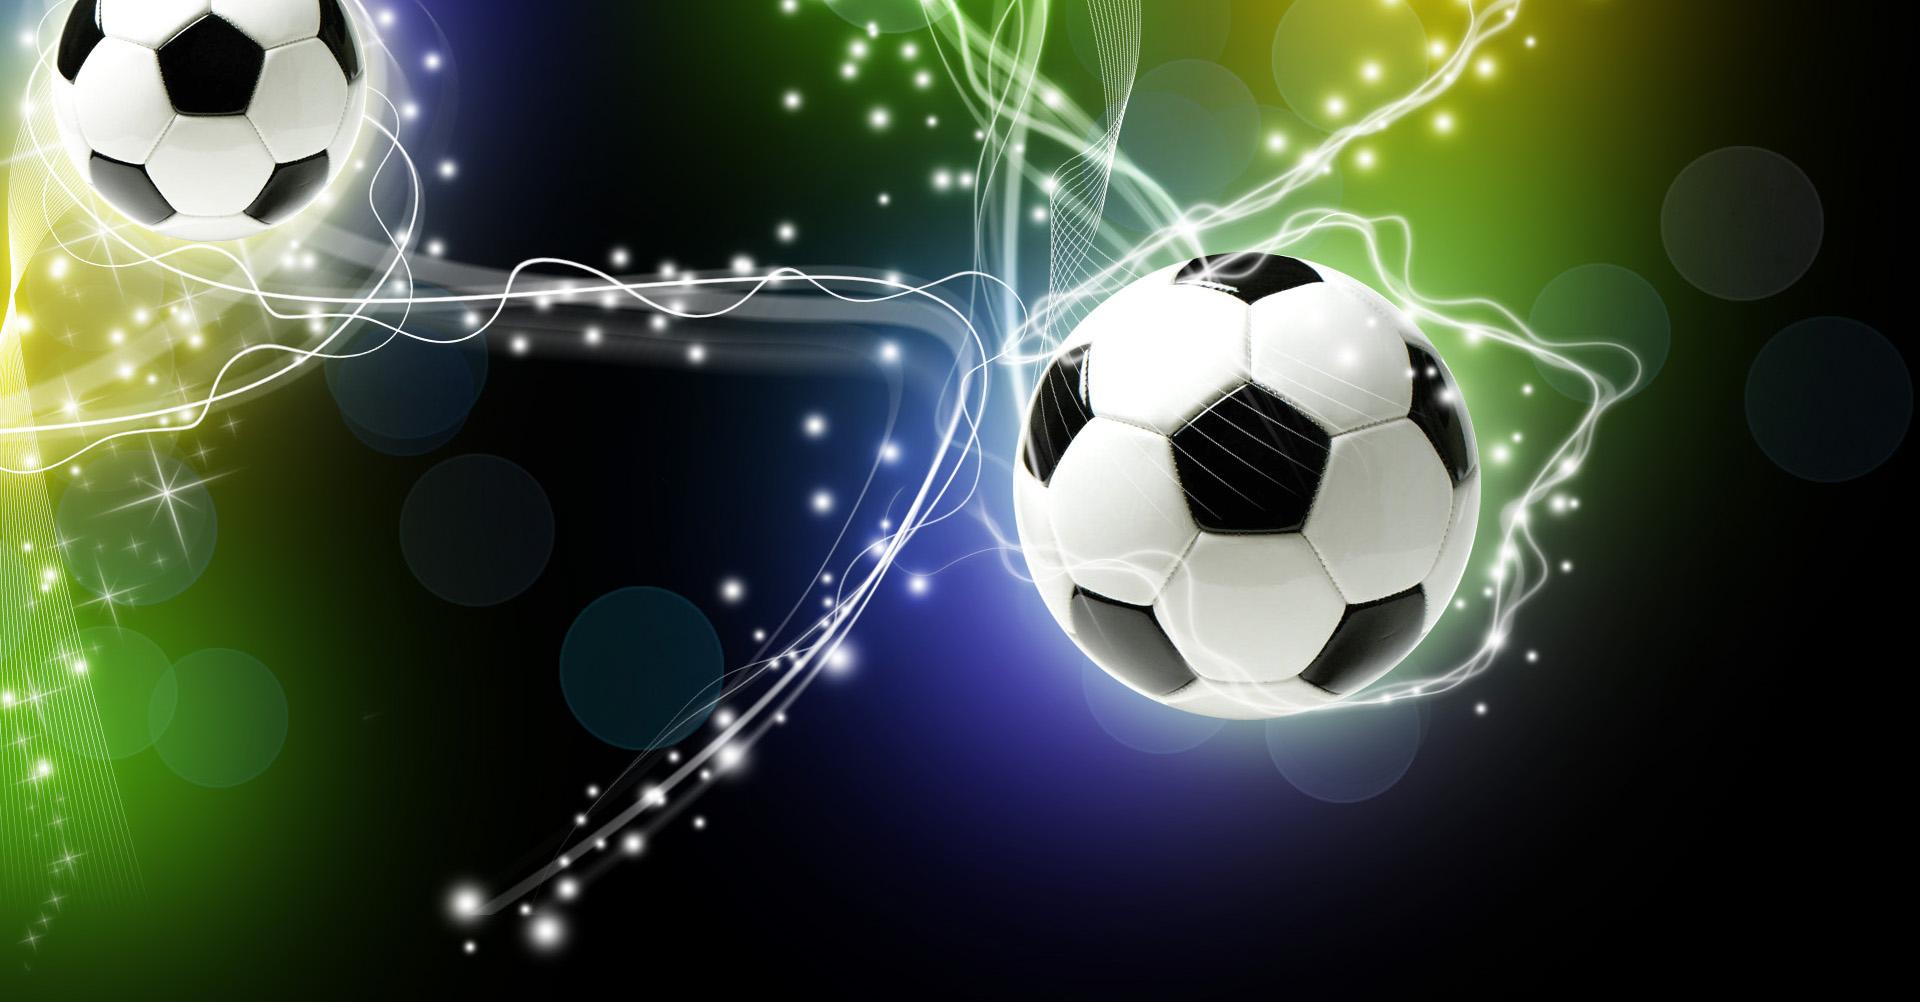 Football Wallpapers Desktop Background: Football Wallpaper For Desktop